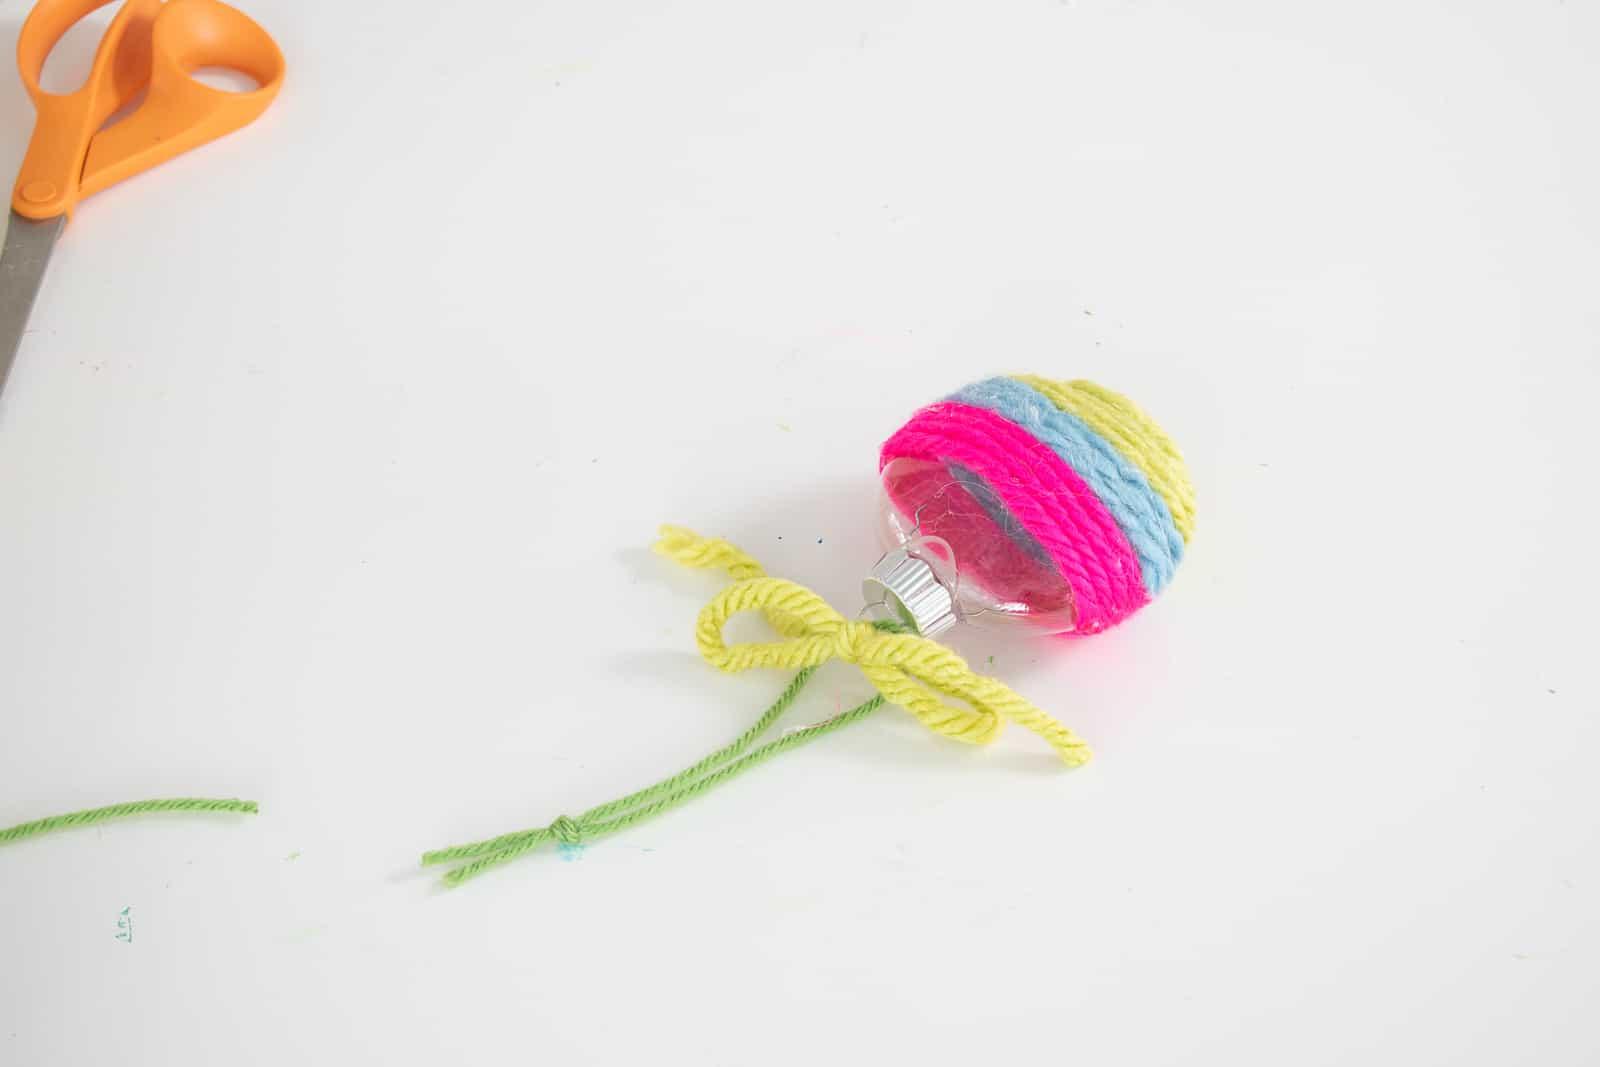 add yarn bow and hang